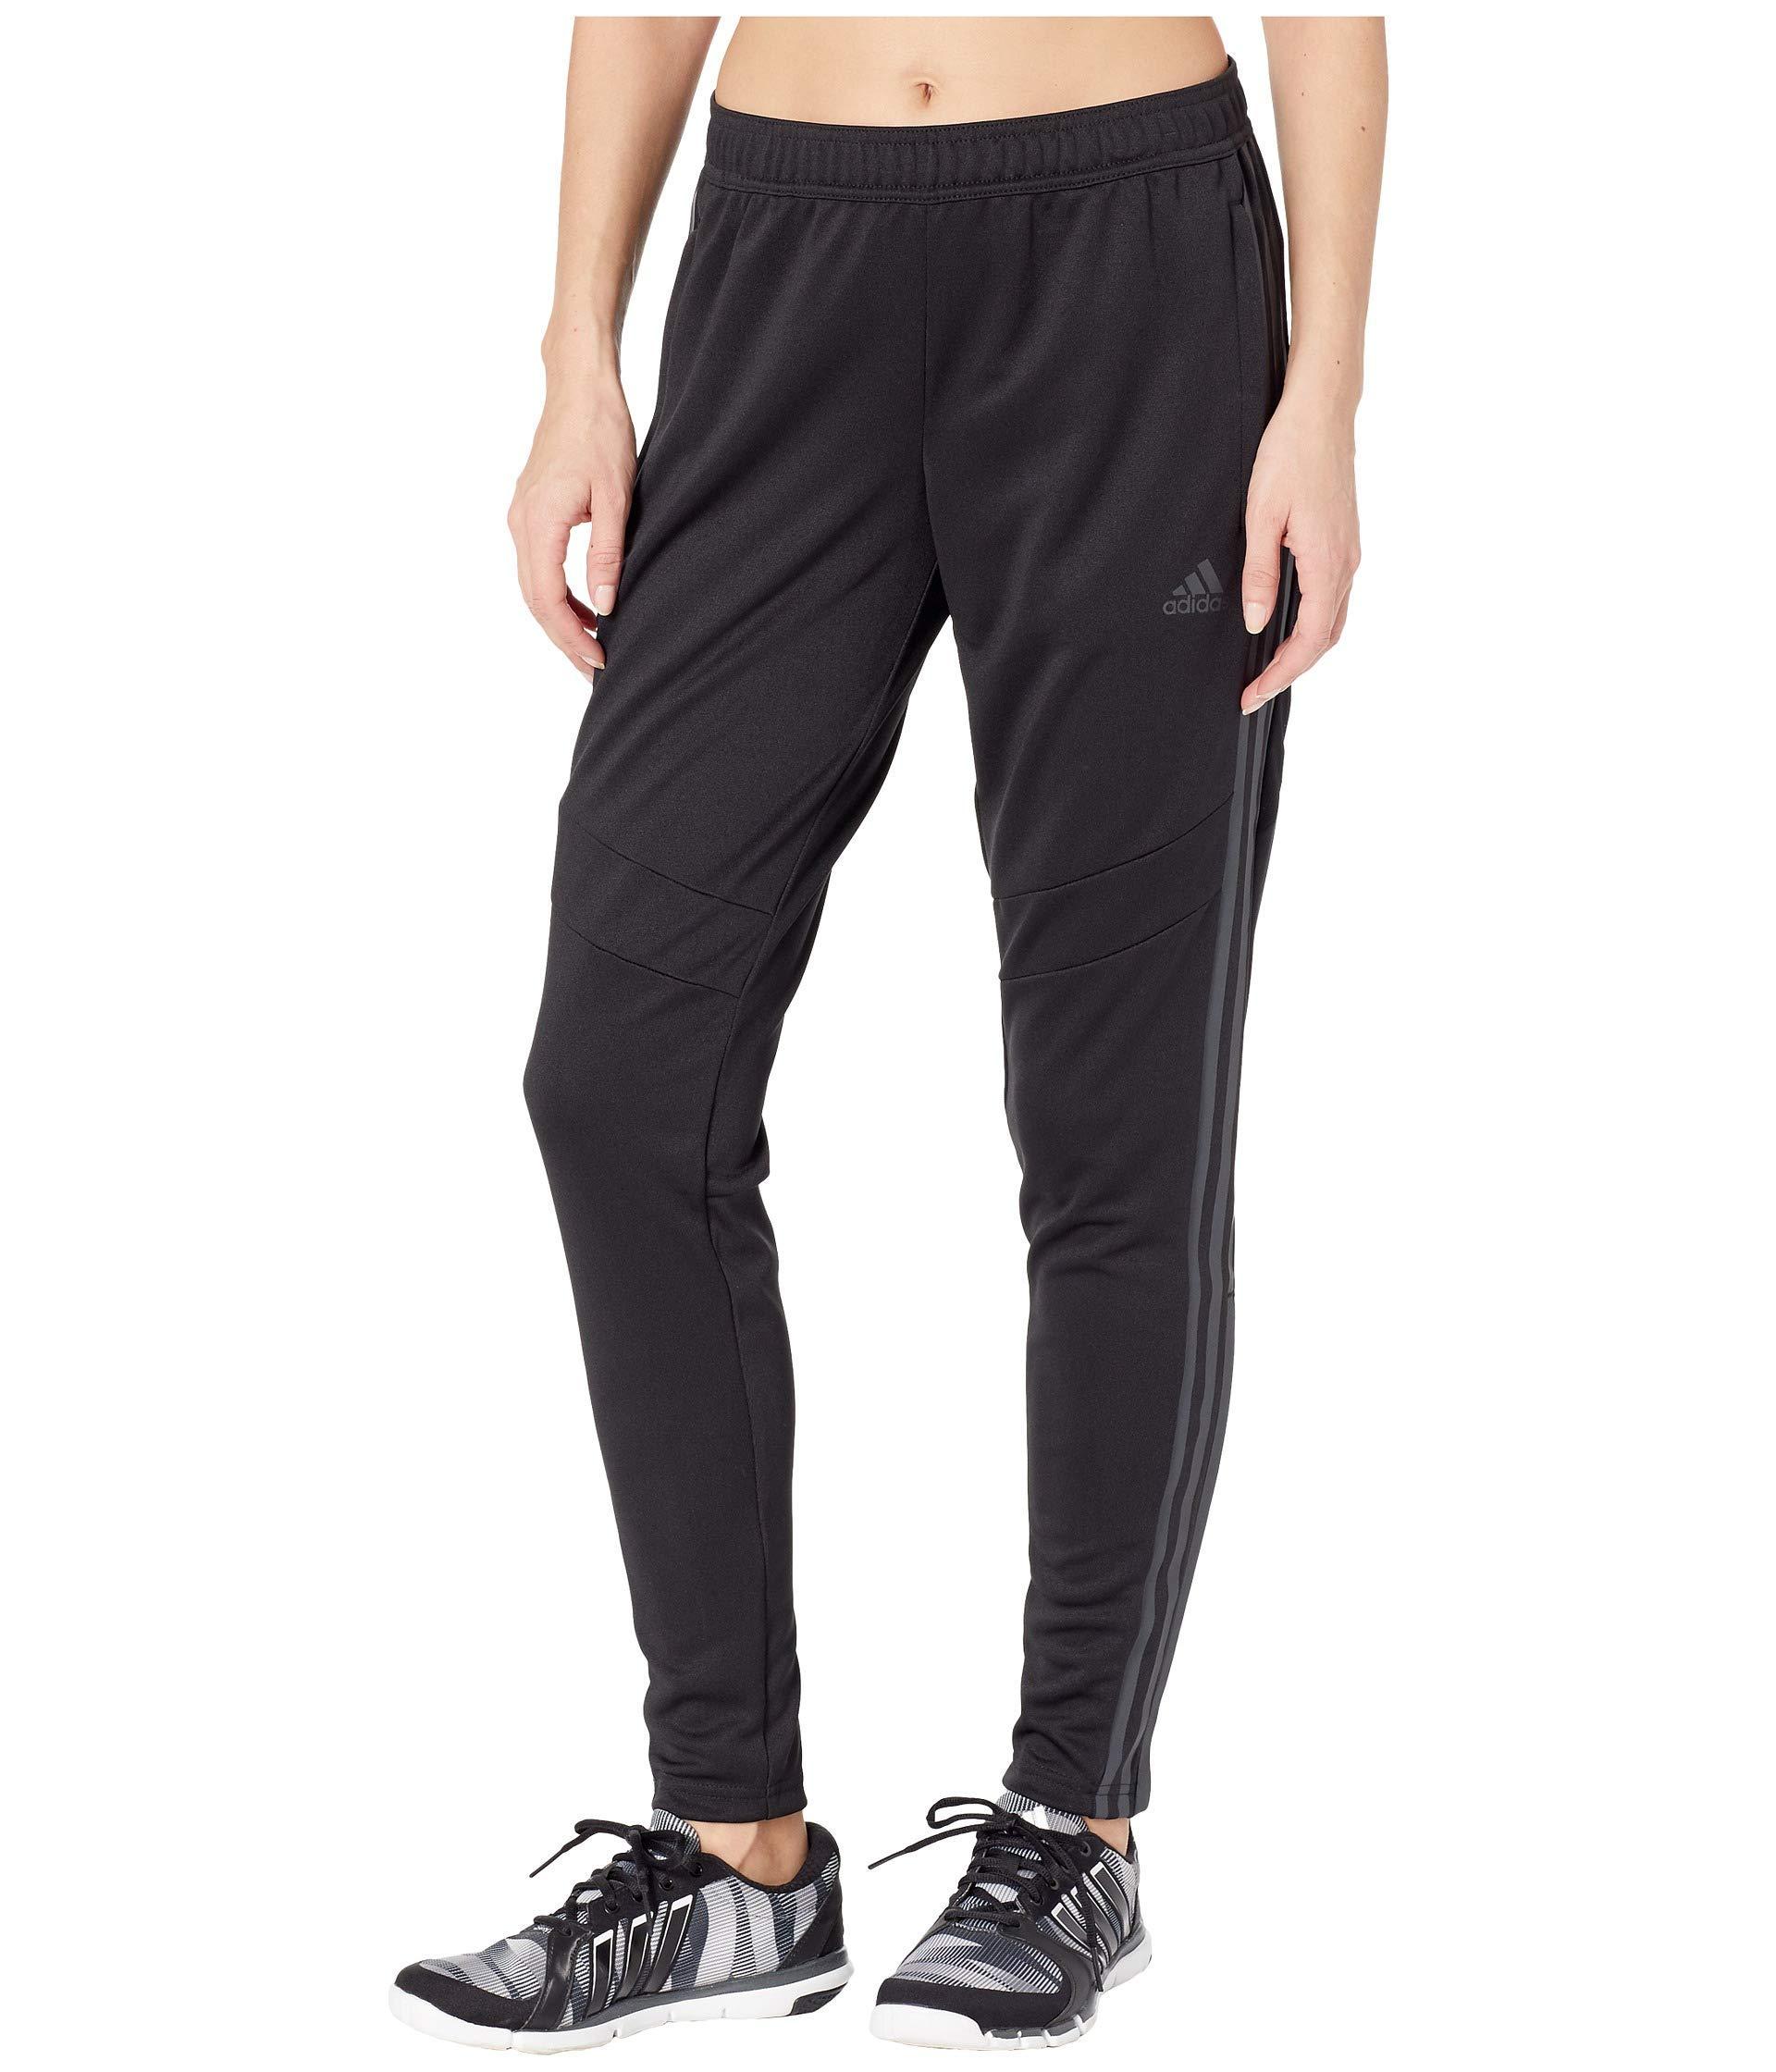 adidas Women's Soccer Tiro 19 Training Pant, Black/Carbon Pearl Essence, Small by adidas